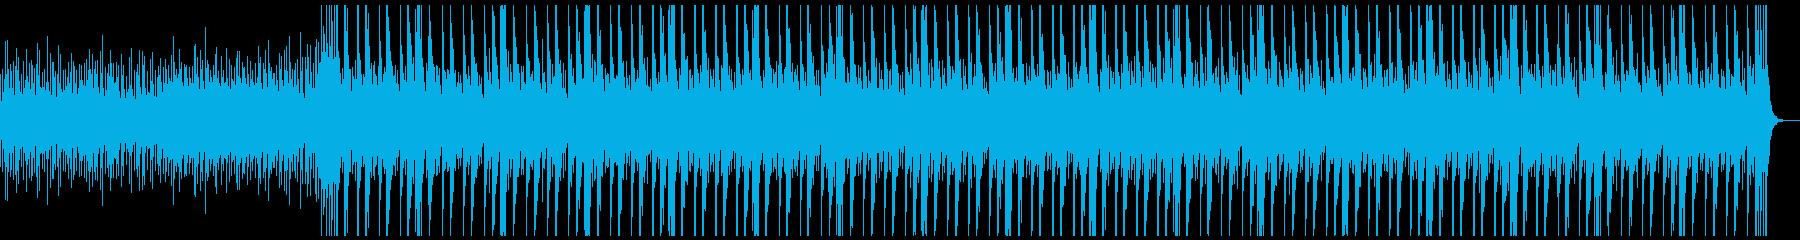 528Hzオルゴールと笛の瞑想BGMの再生済みの波形